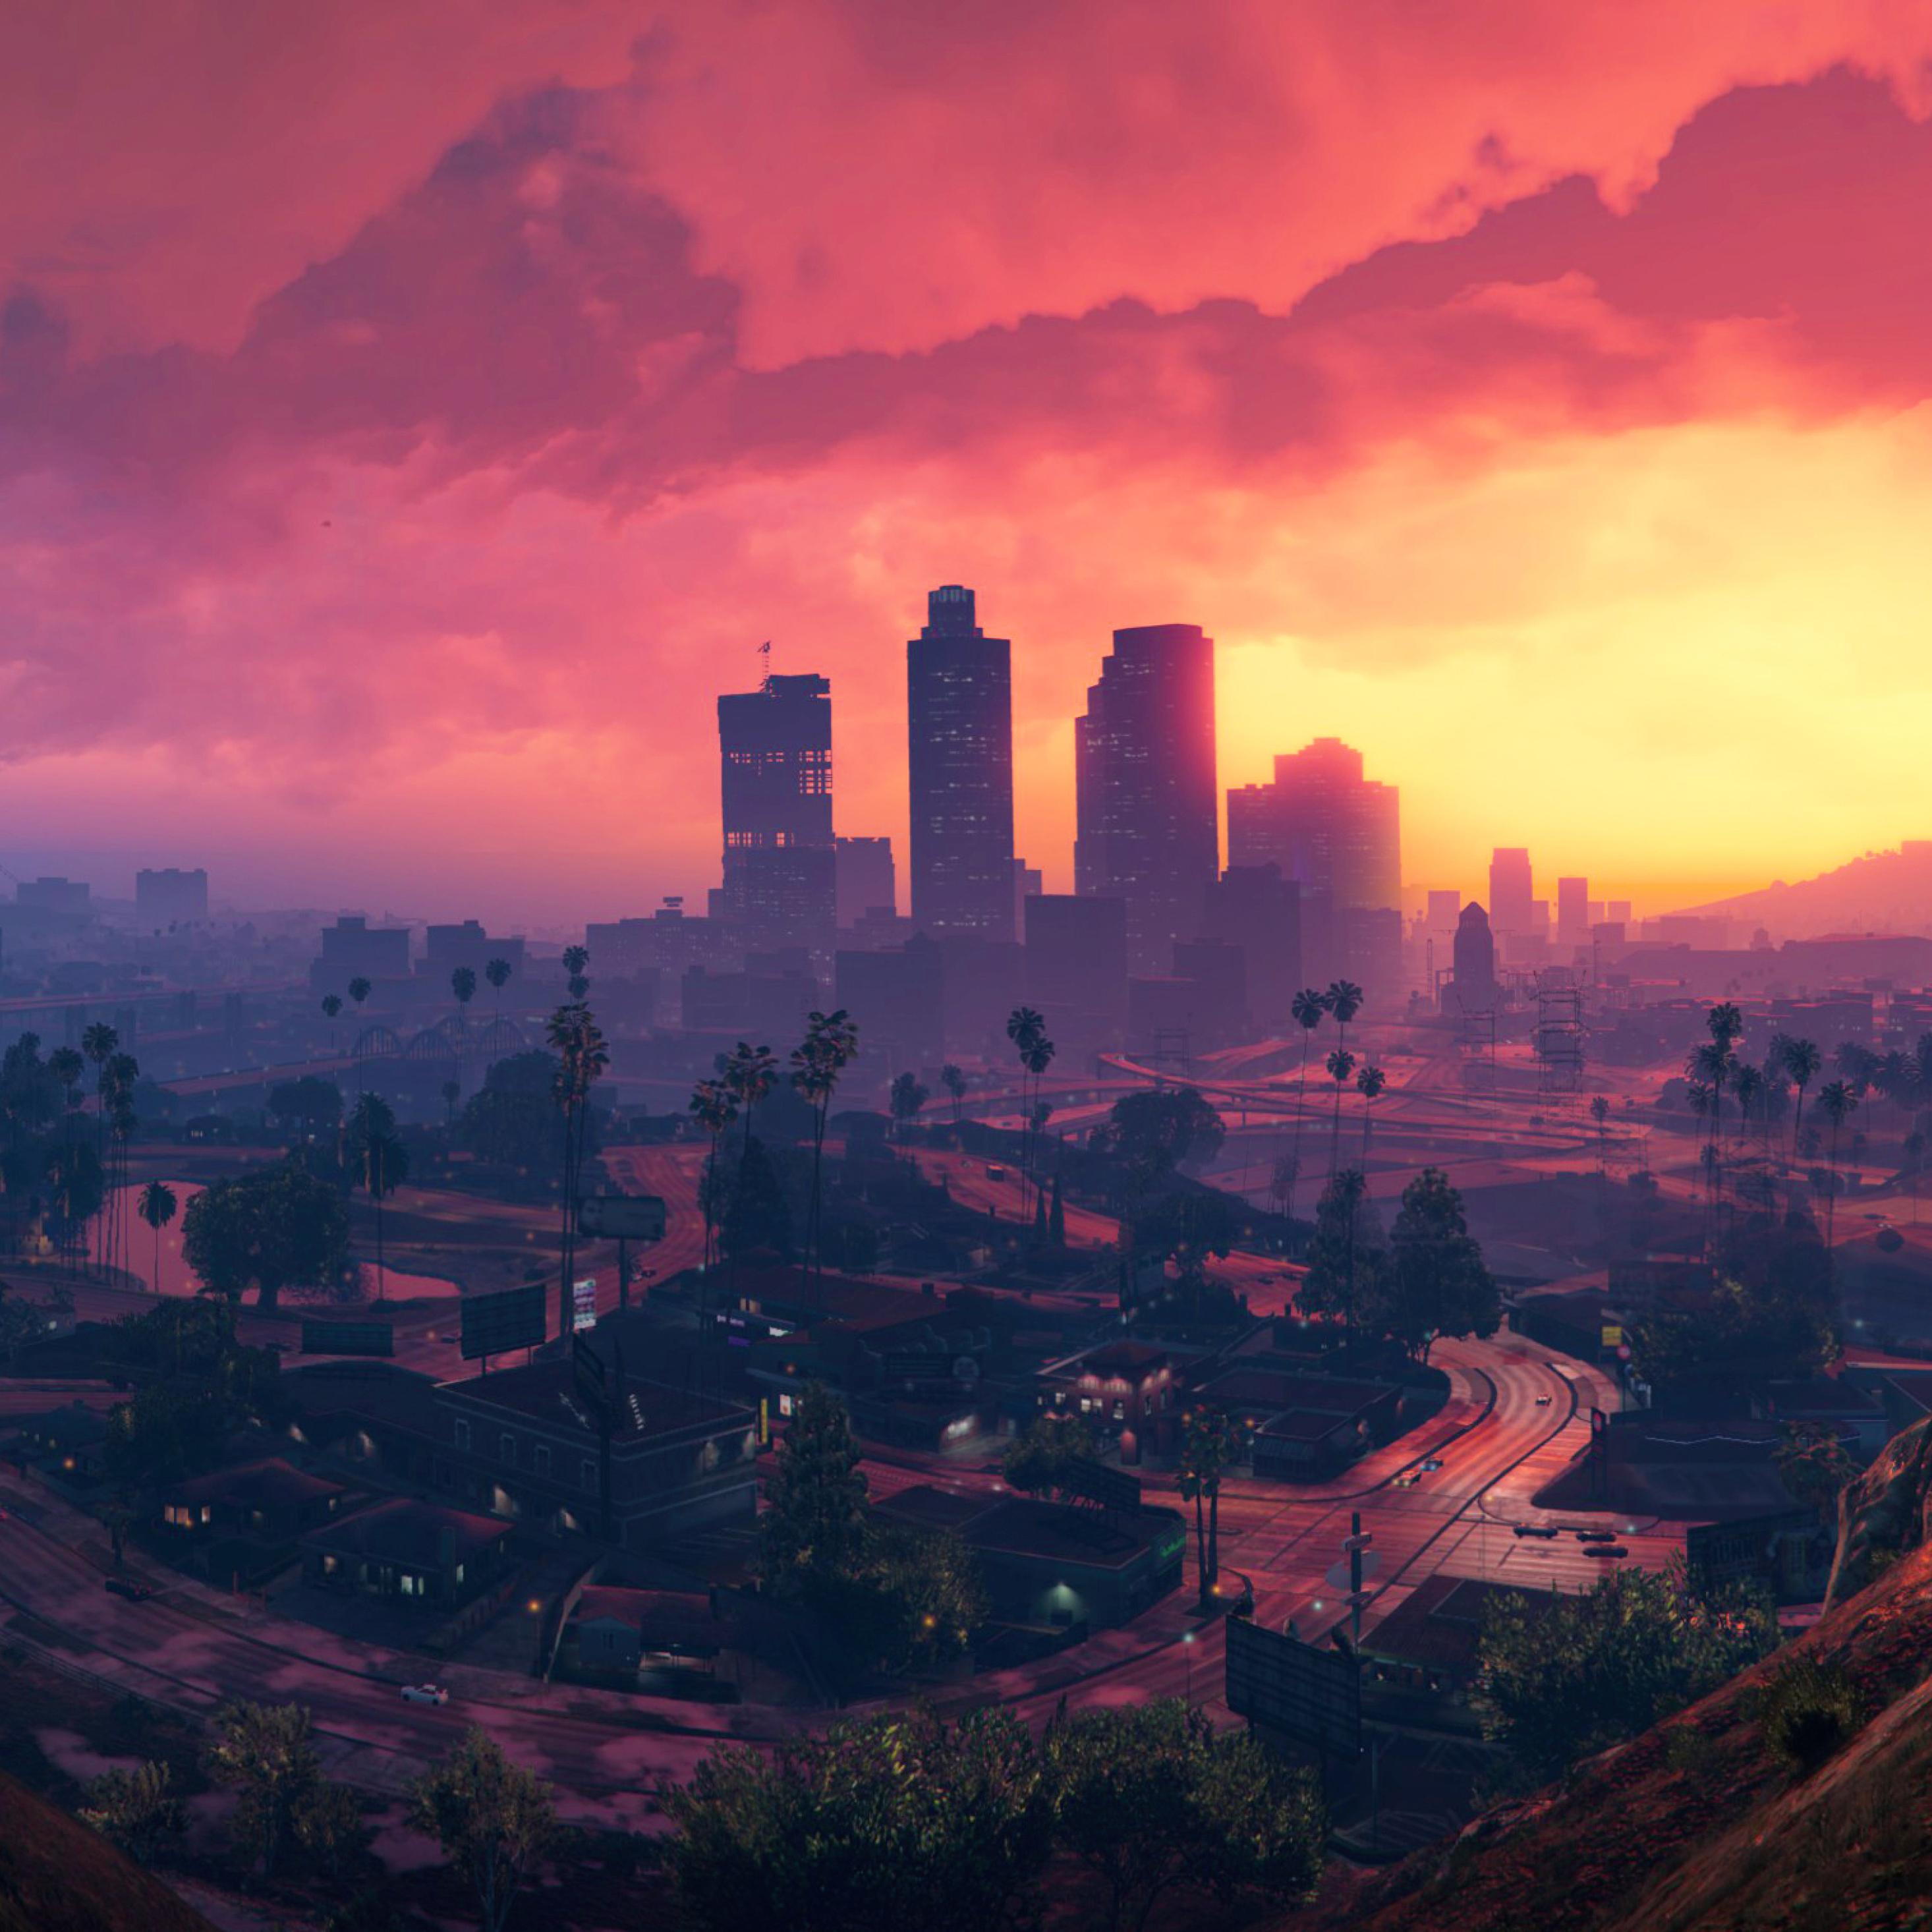 2932x2932 4K Grand Theft Auto V Scenery Ipad Pro Retina